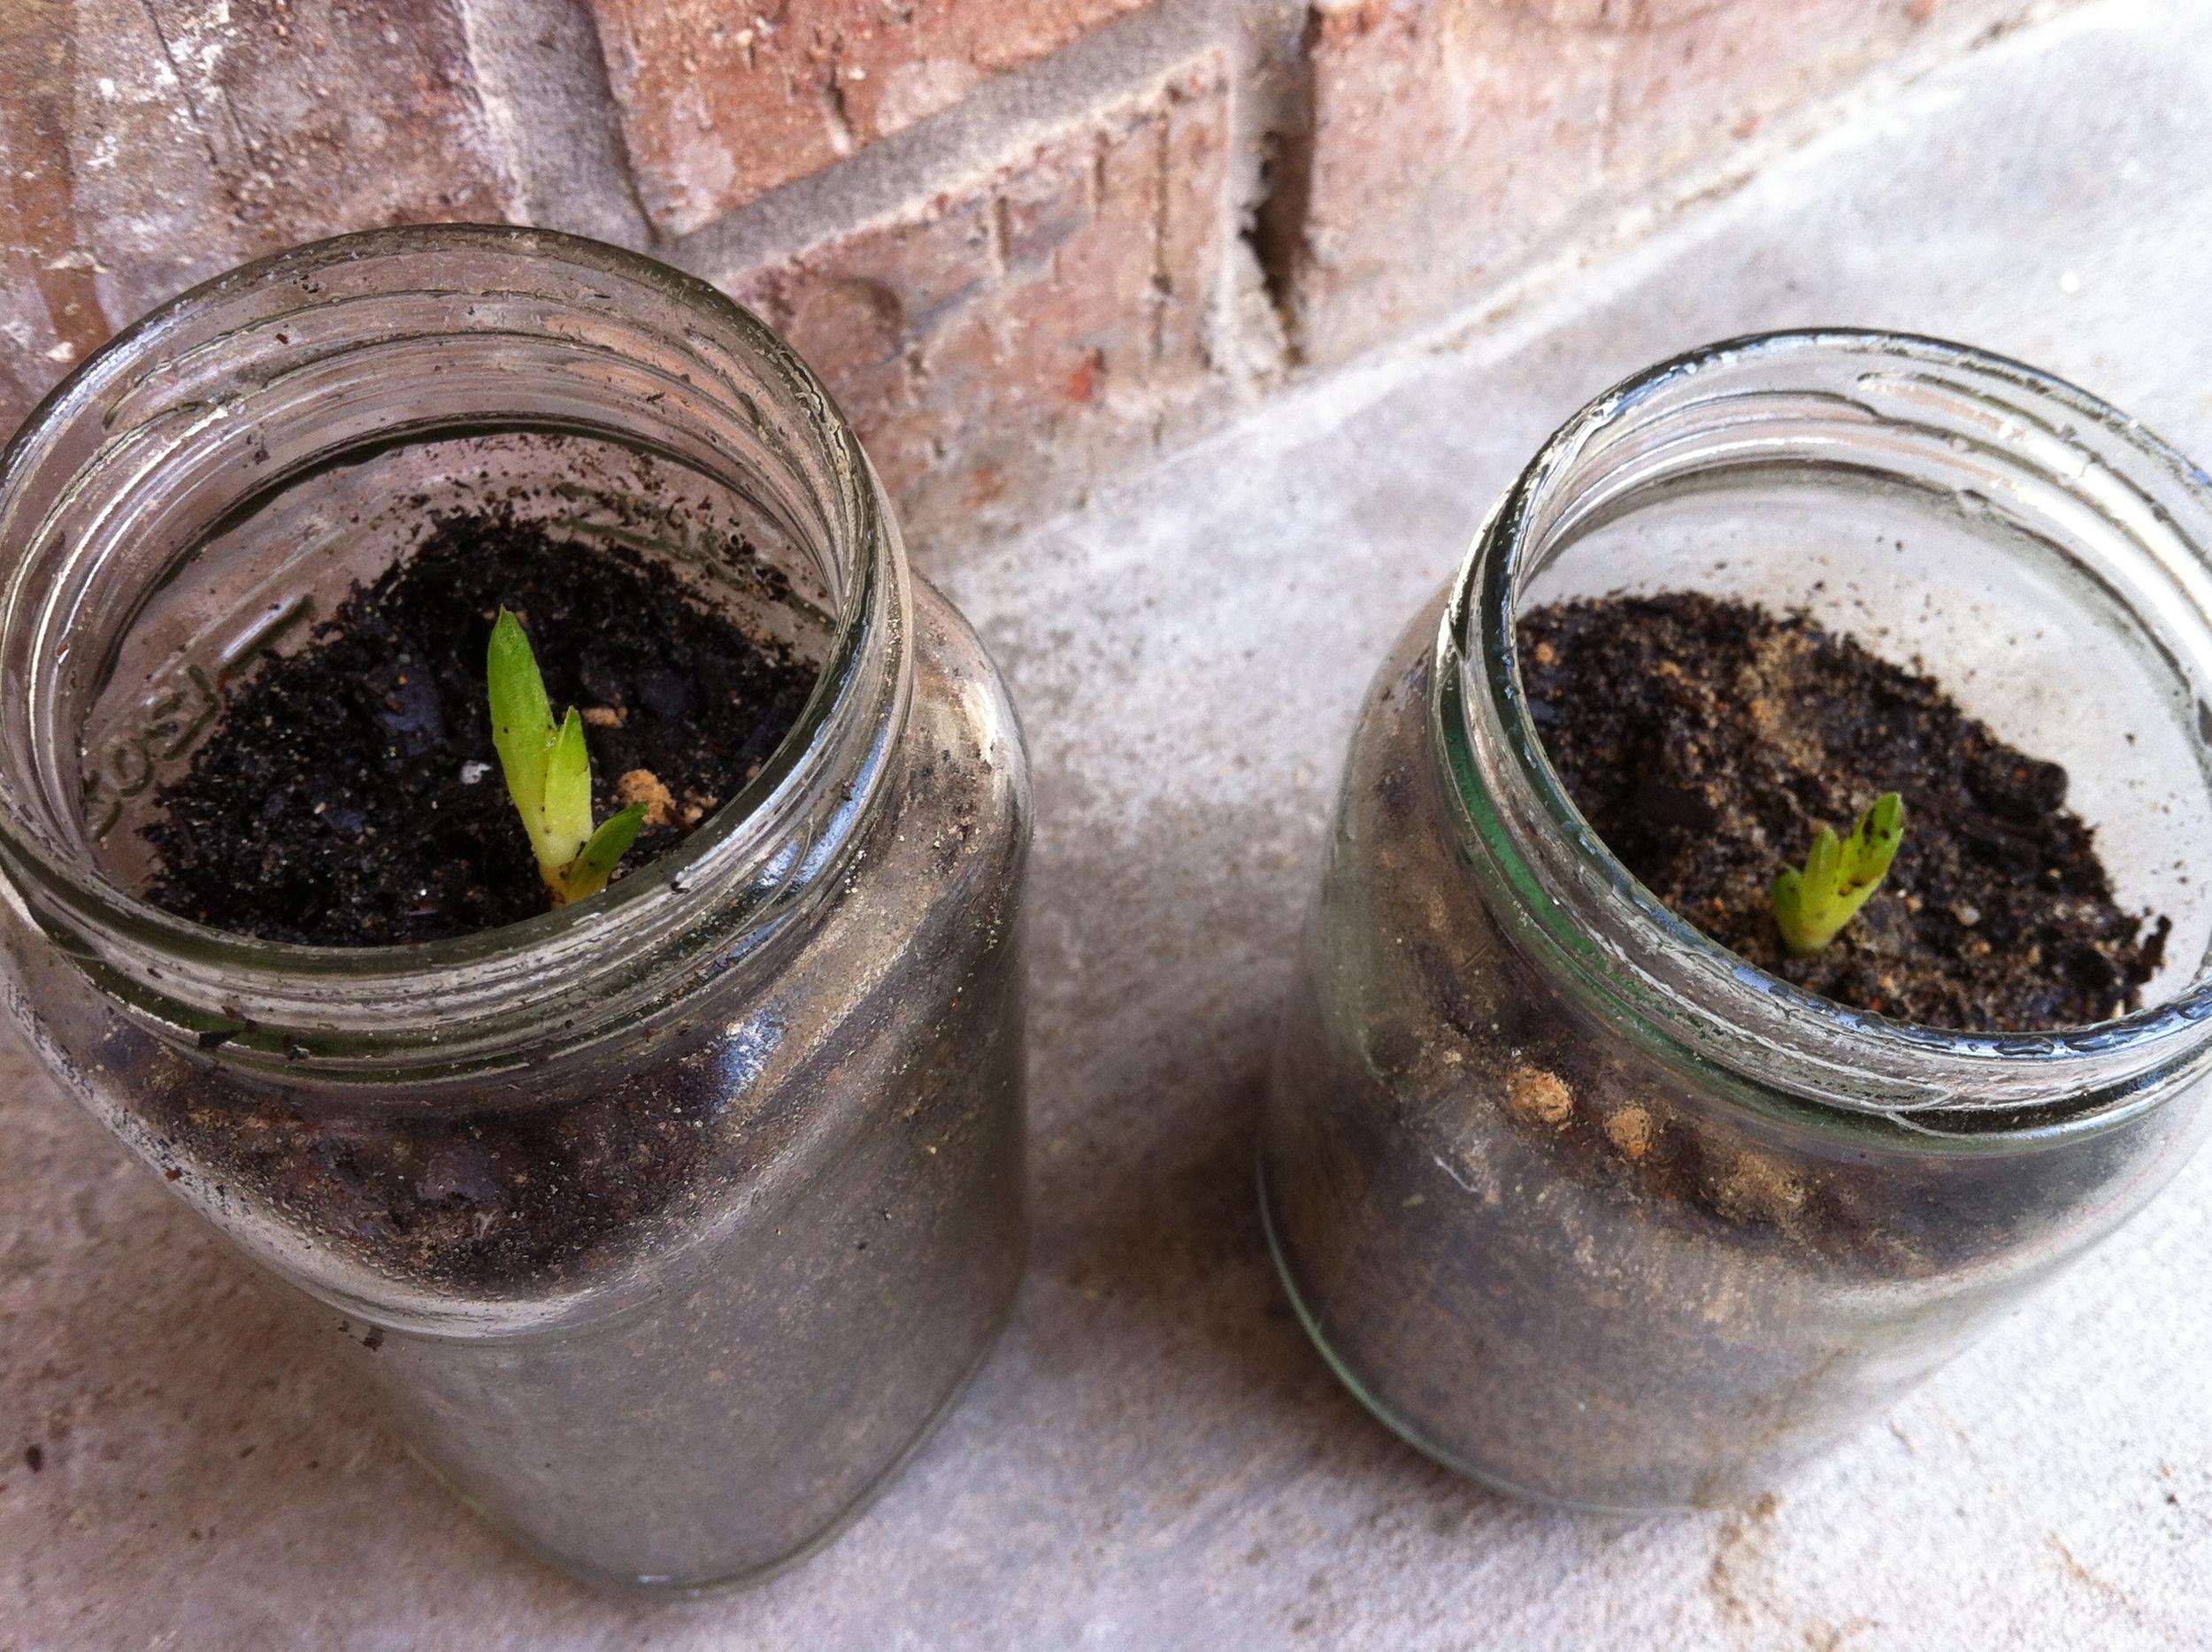 July 2012: Propagated aloe vera plants in jars.